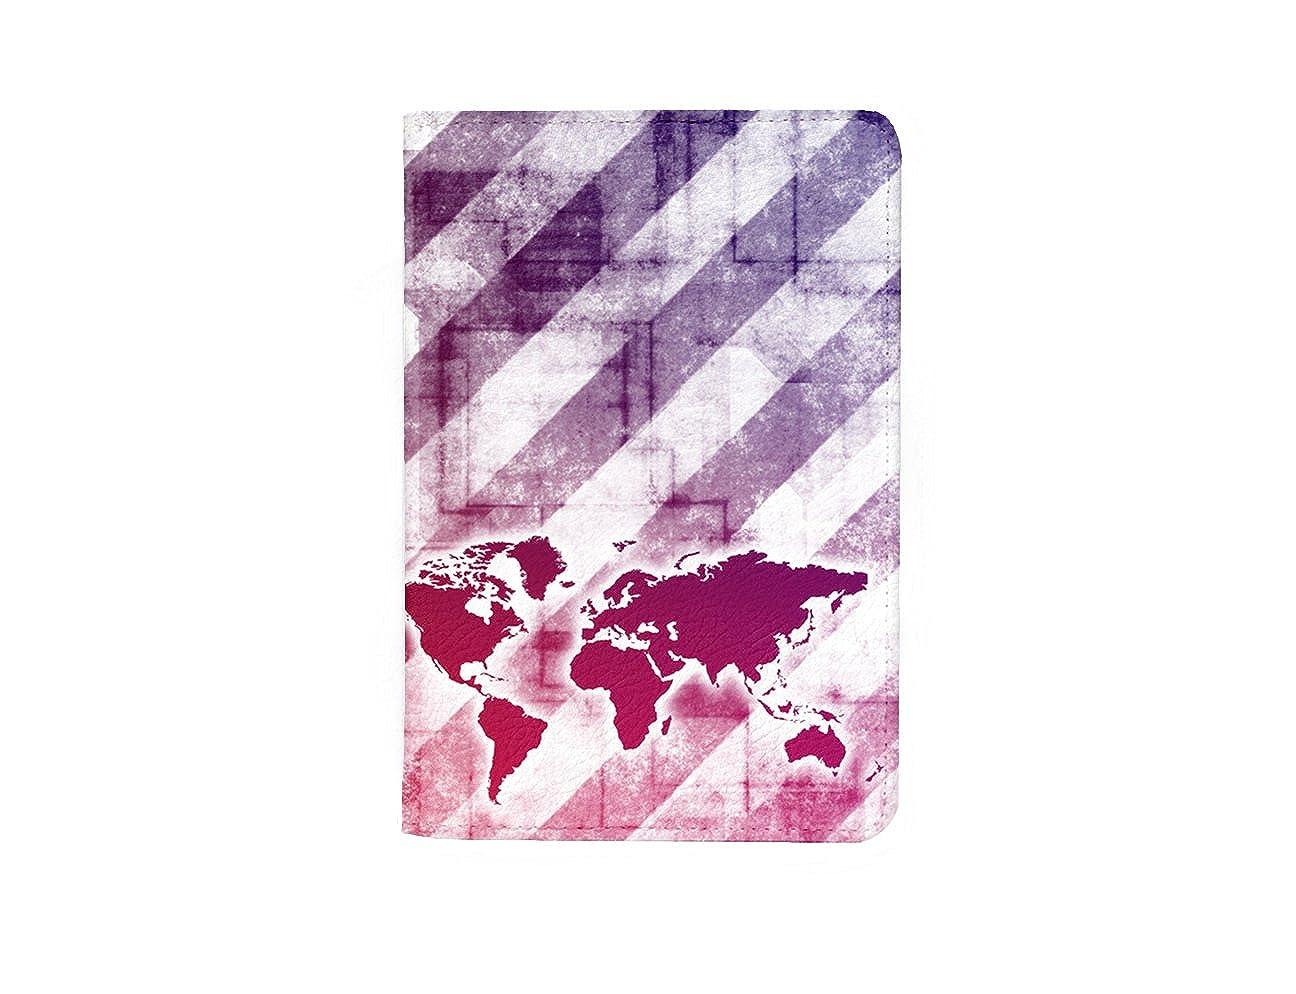 Vintage World Map Leather Business Passport Holder Protector Cover/_SUPERTRAMPshop